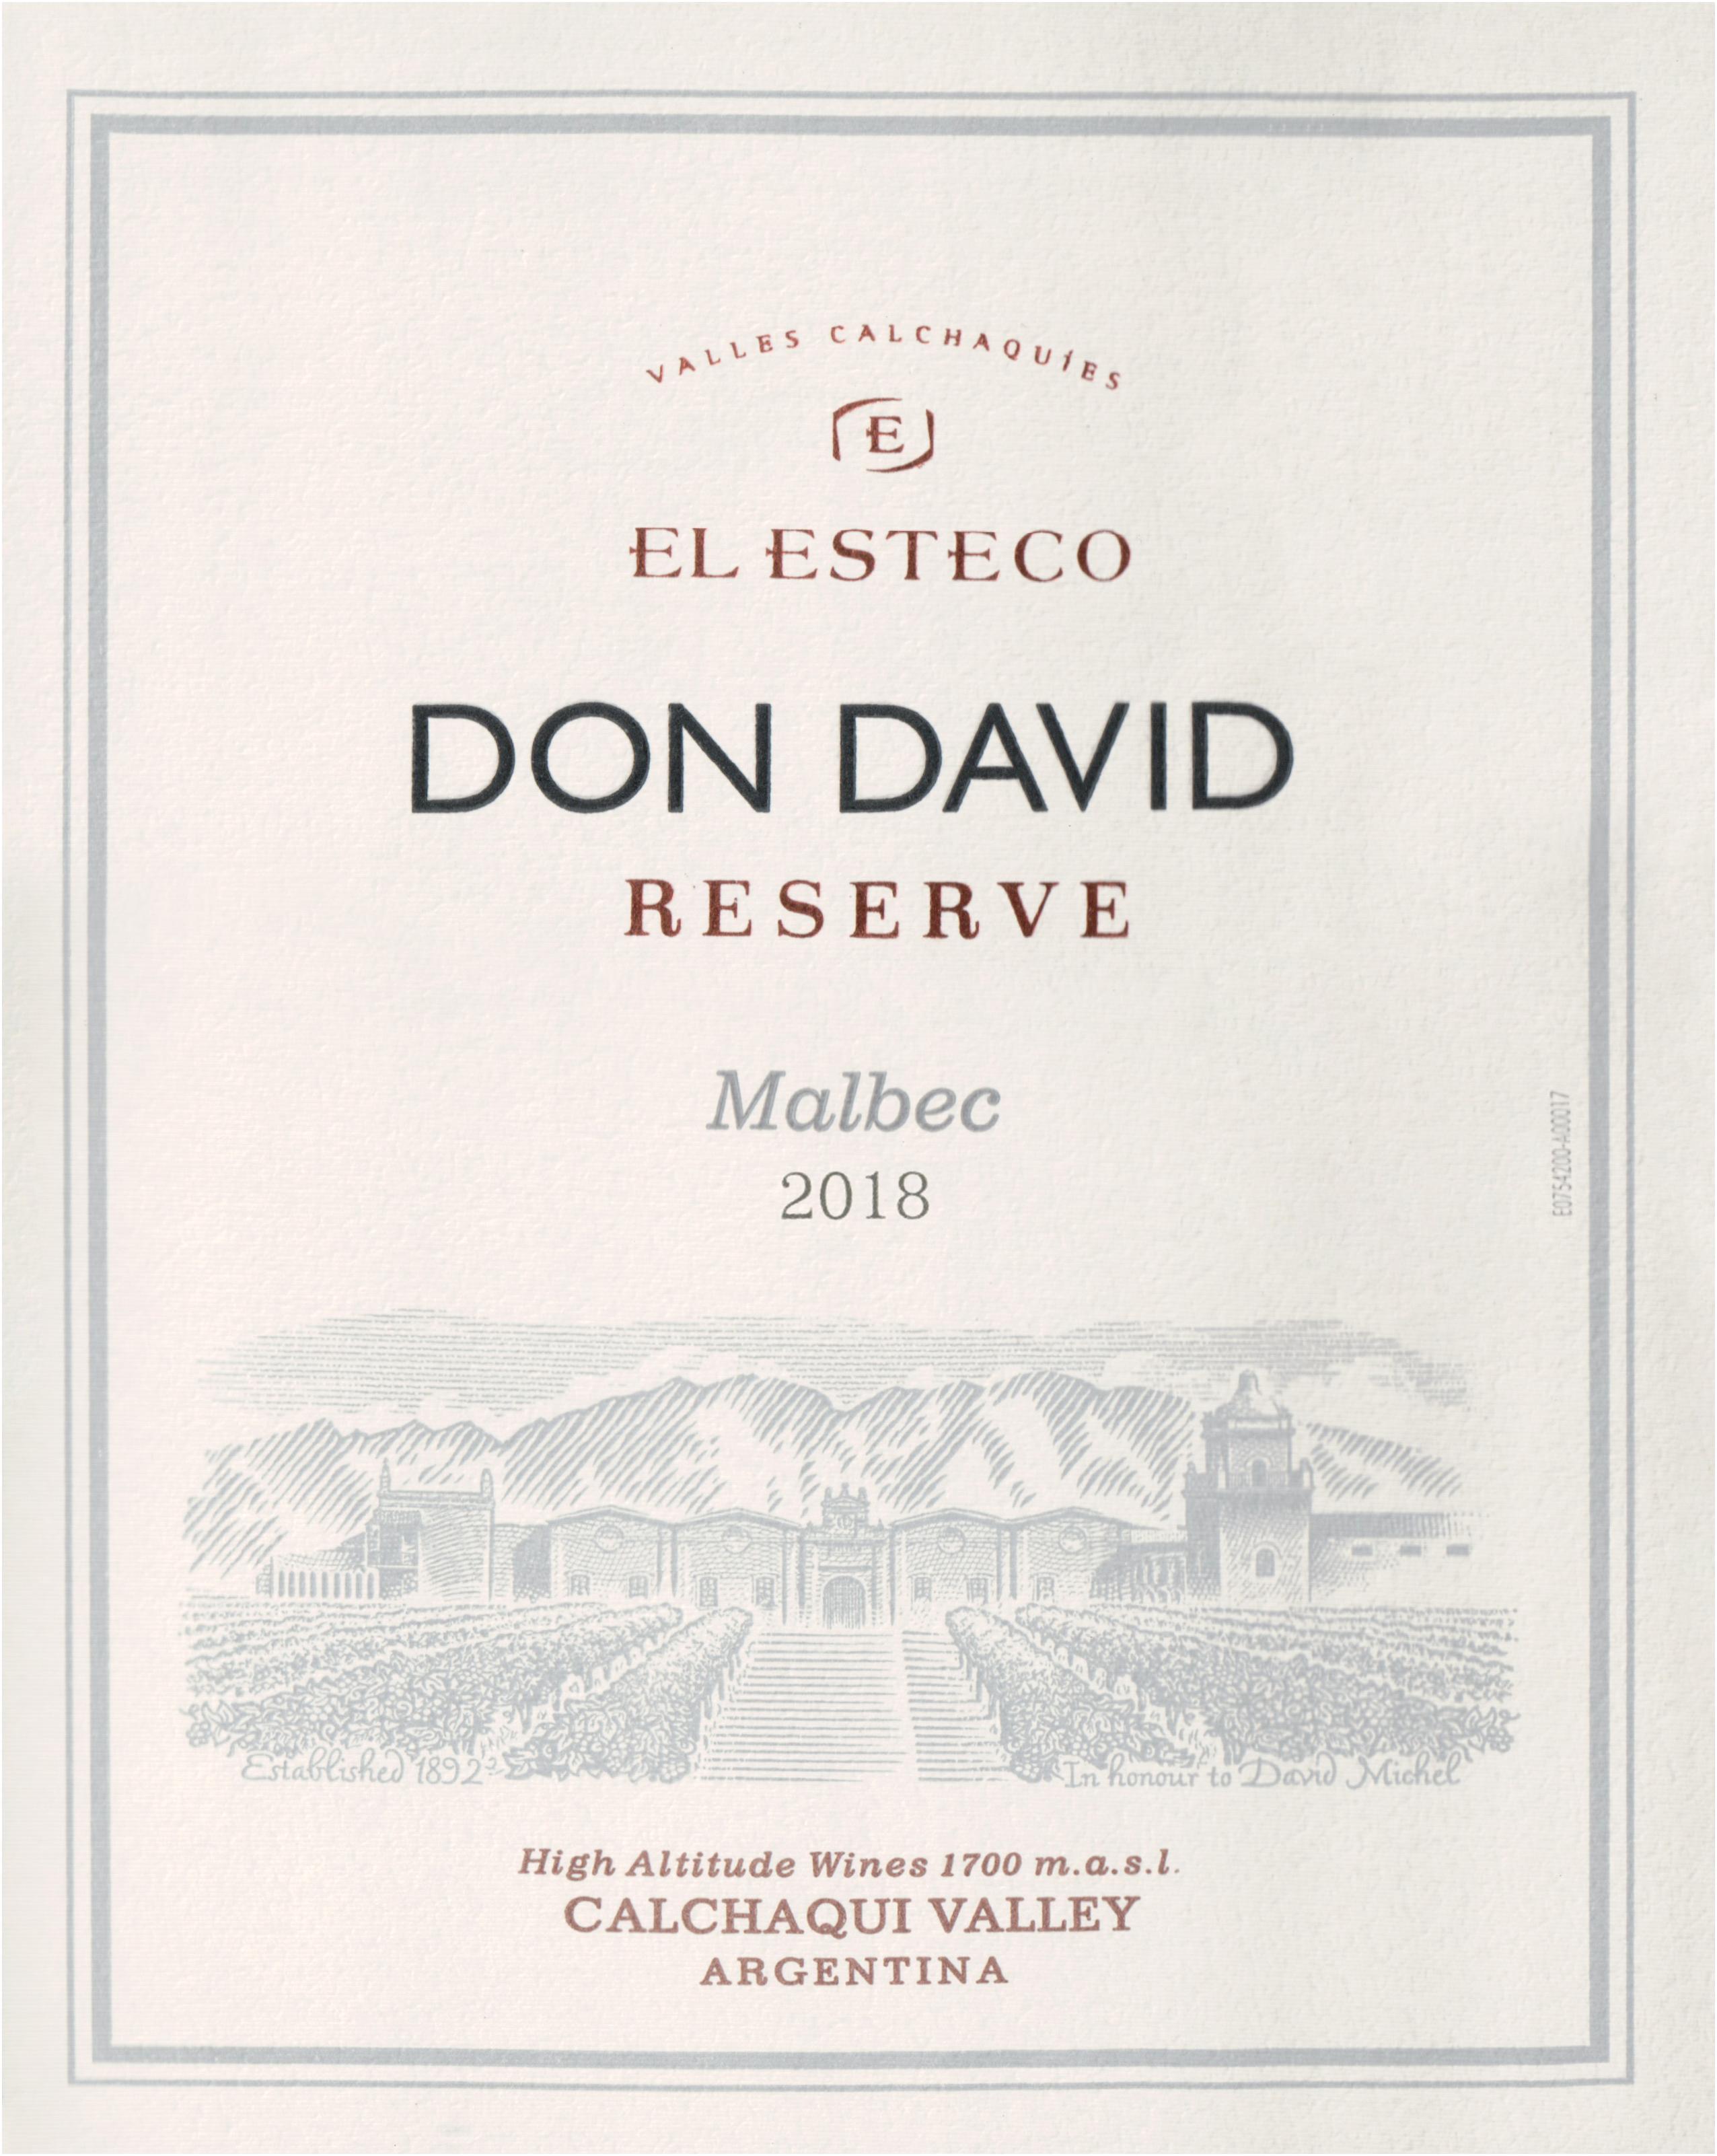 El Esteco Malbec Don David Reserve 2018